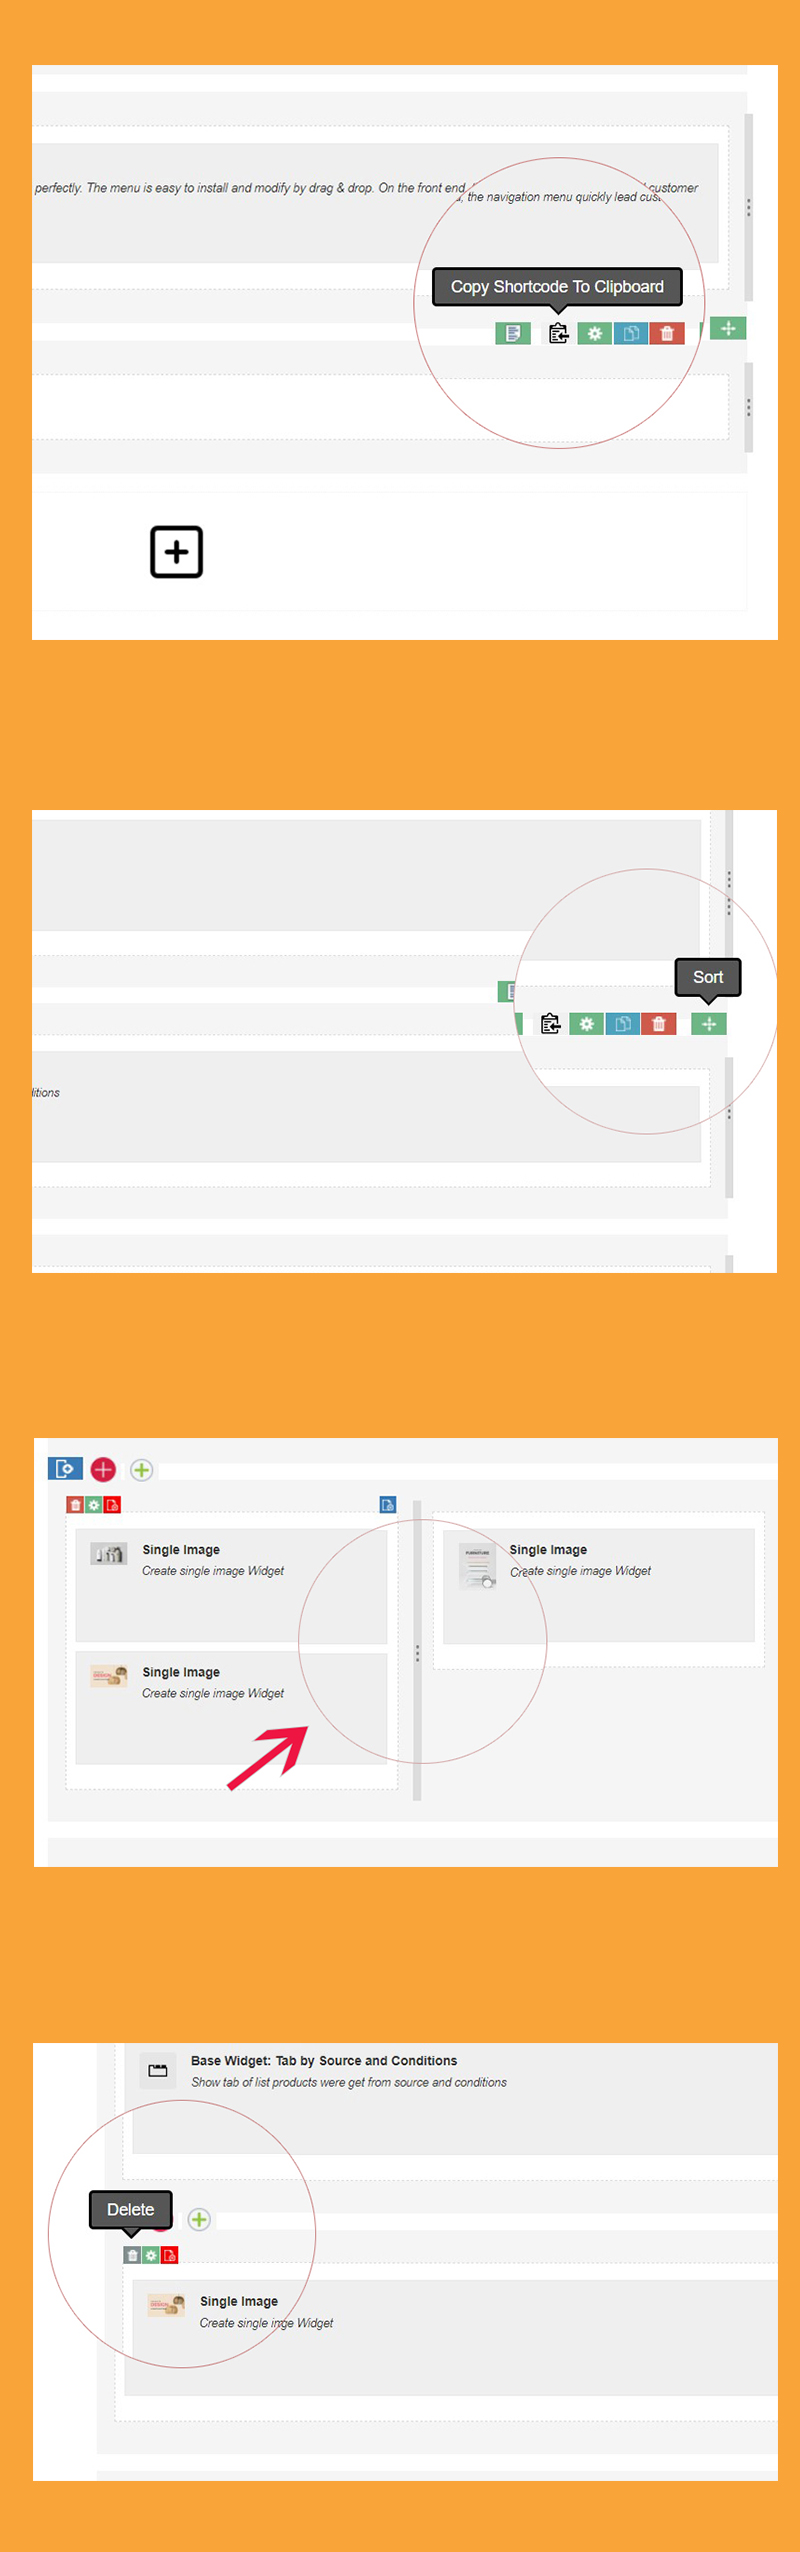 create magento 2 page profile